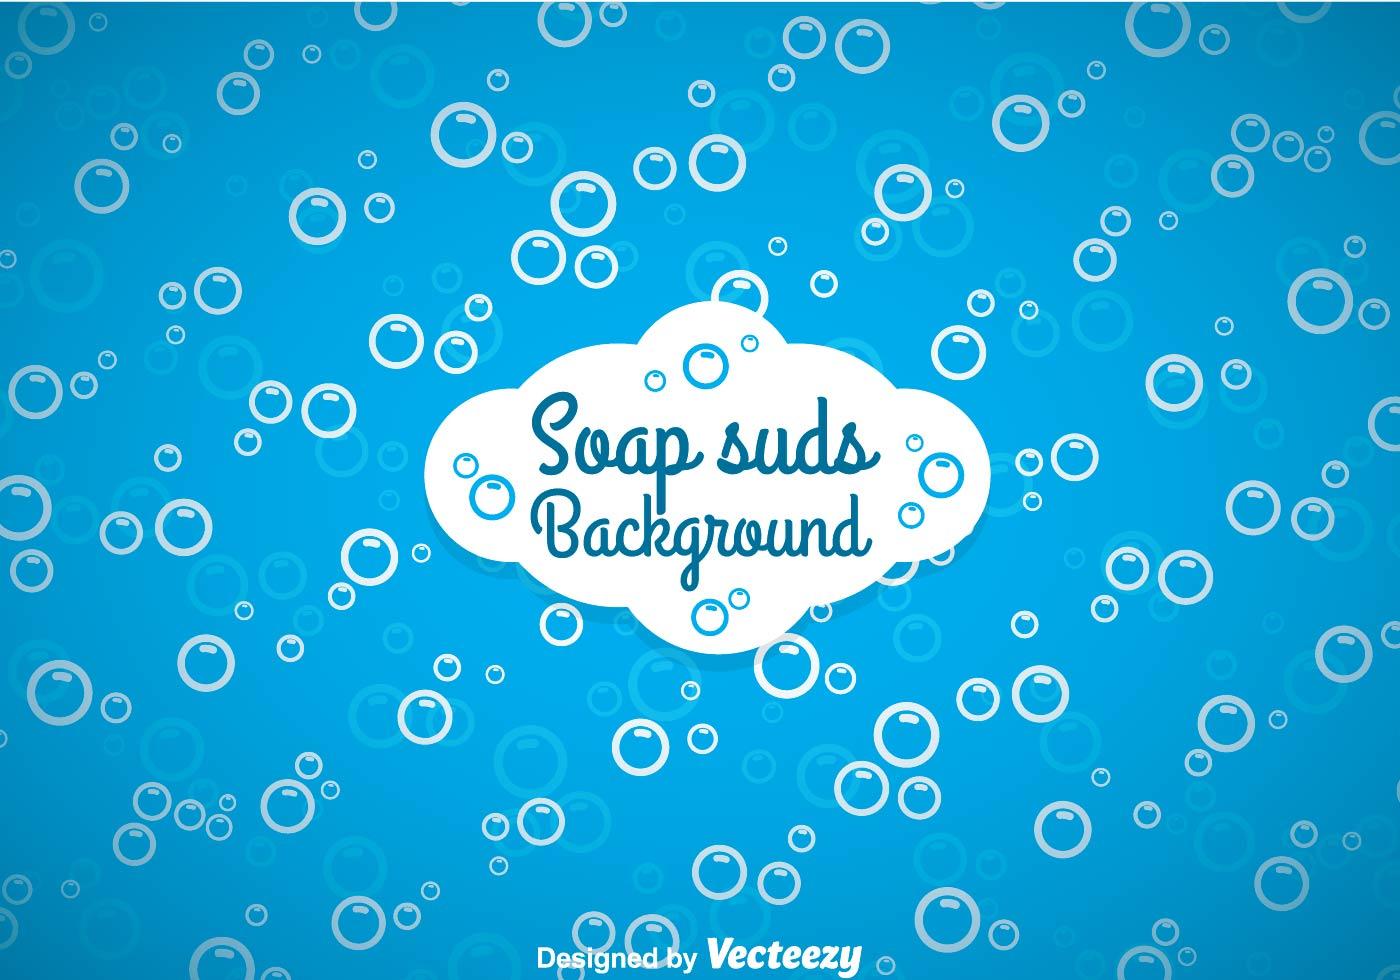 Soap Suds Background Download Free Vectors Clipart